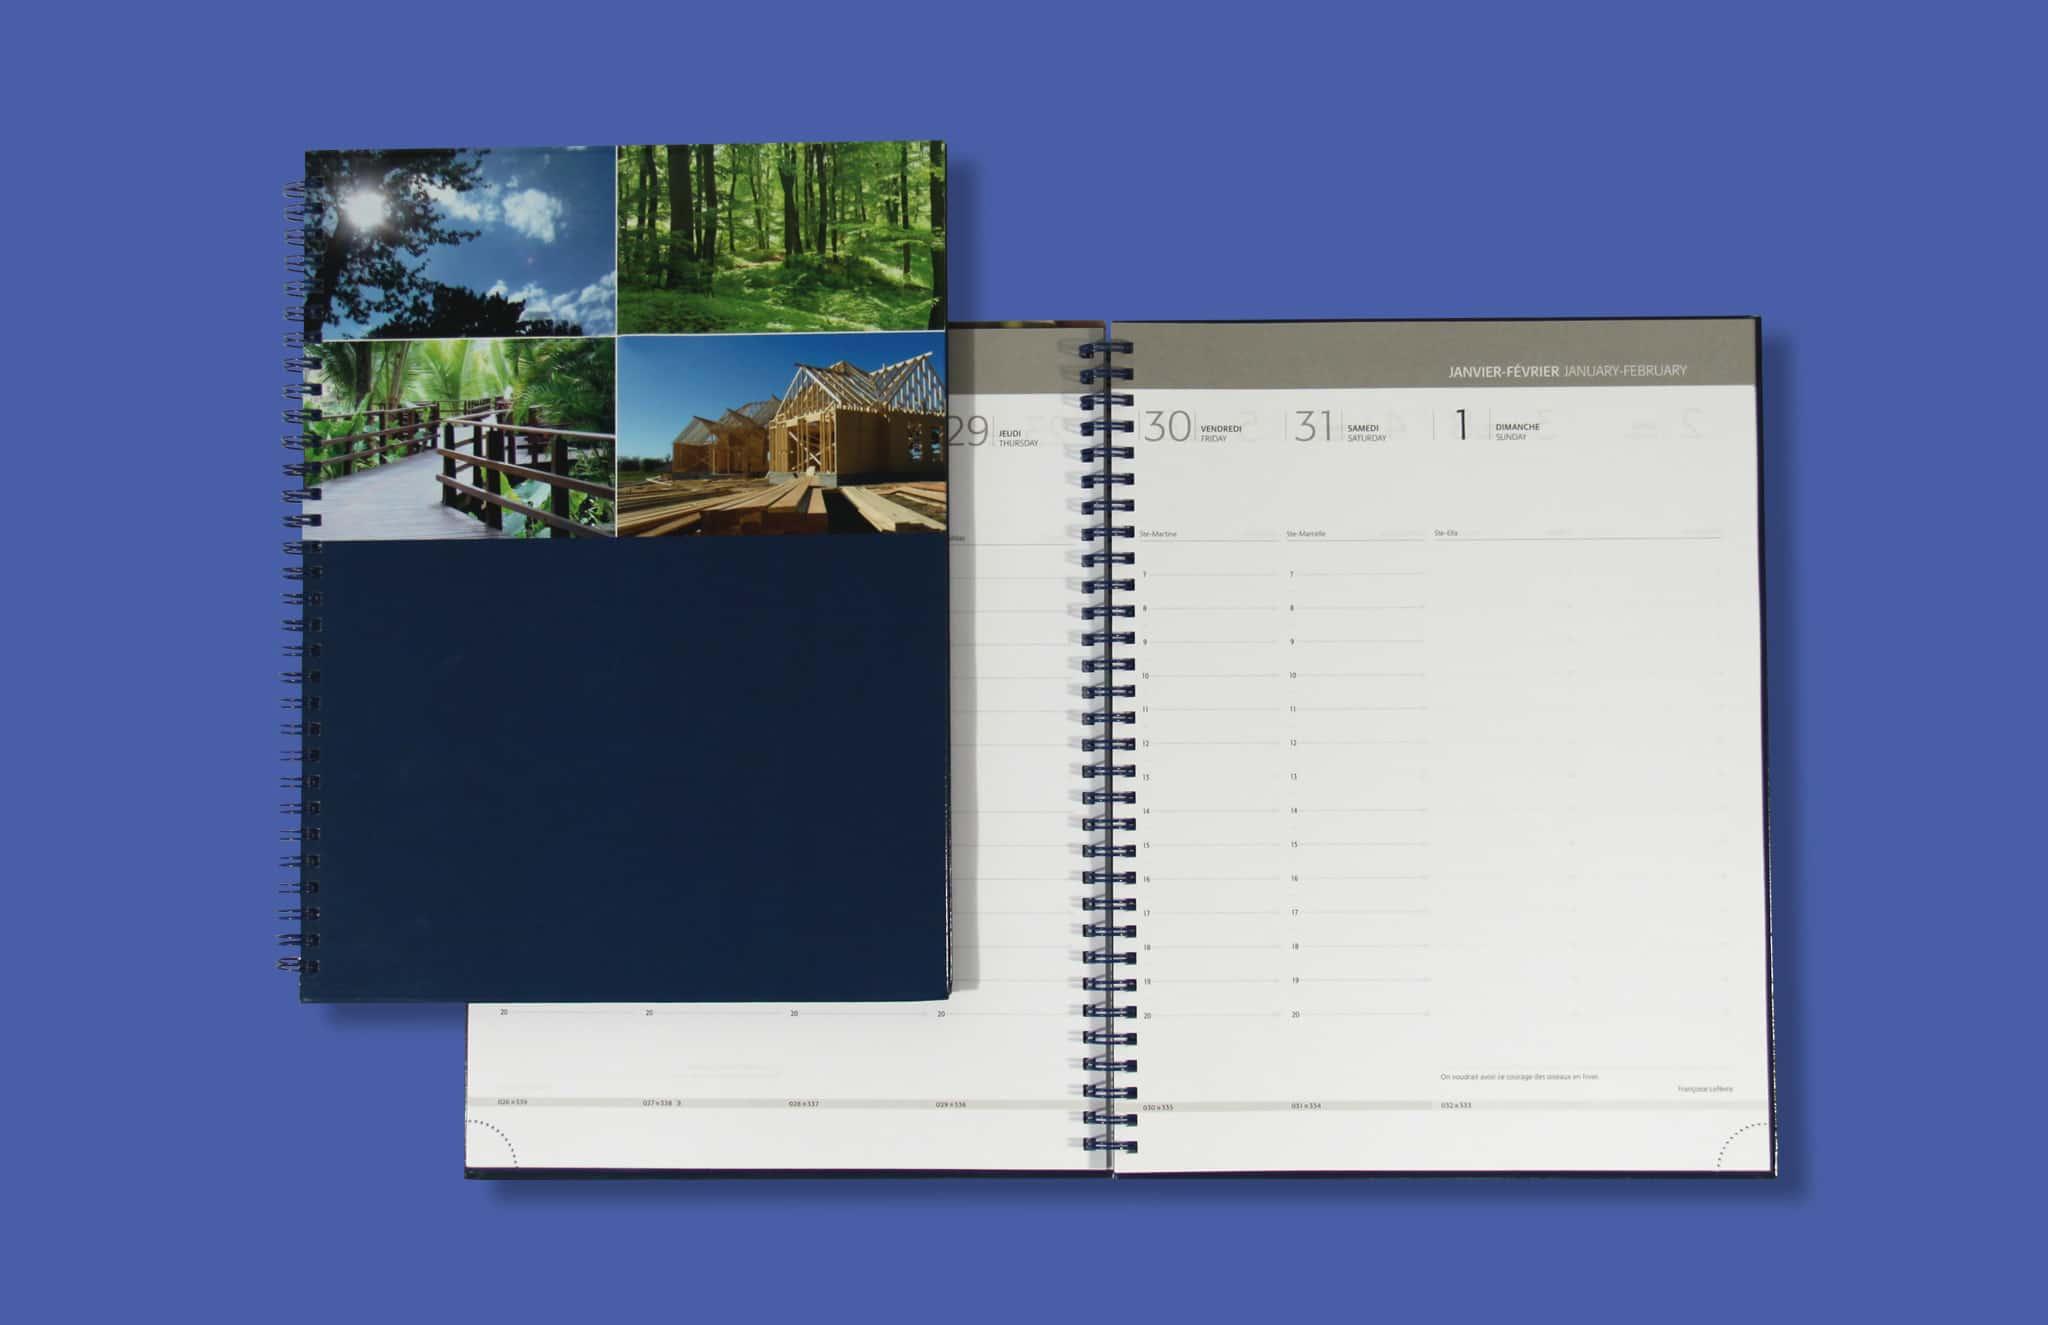 Agenda Bureau V27 Couverture Imprimee Reliure Spirale